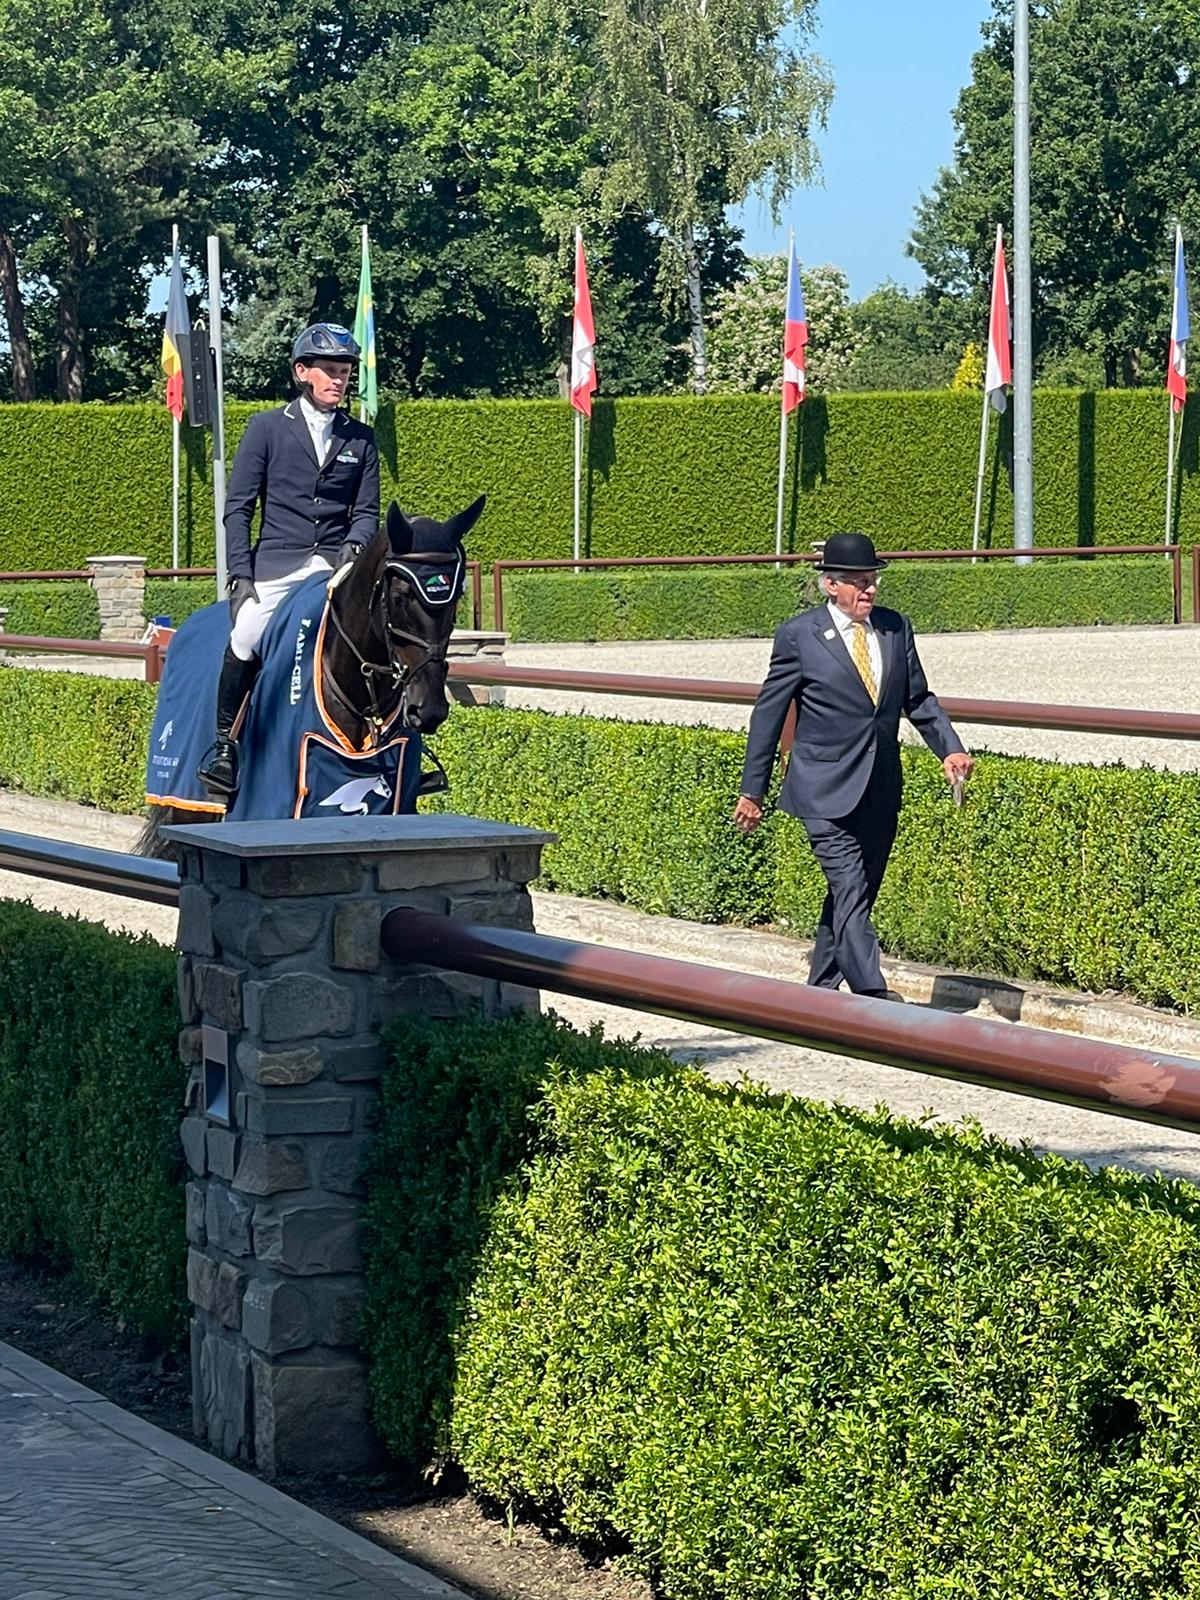 Darragh Kenny wins in Valkenswaard with new World Champion